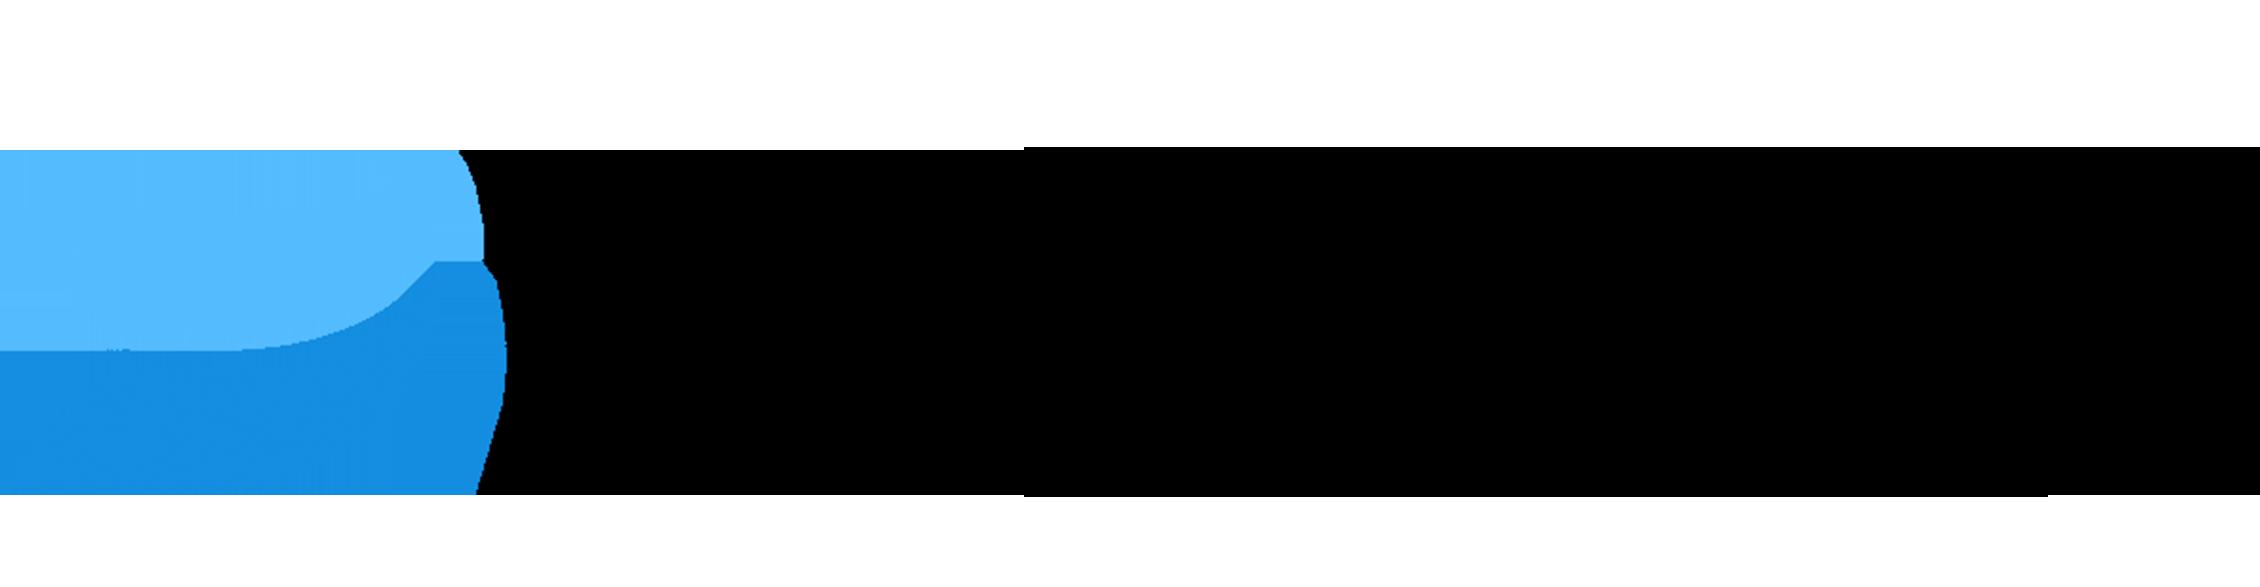 Wistia_Logo.png